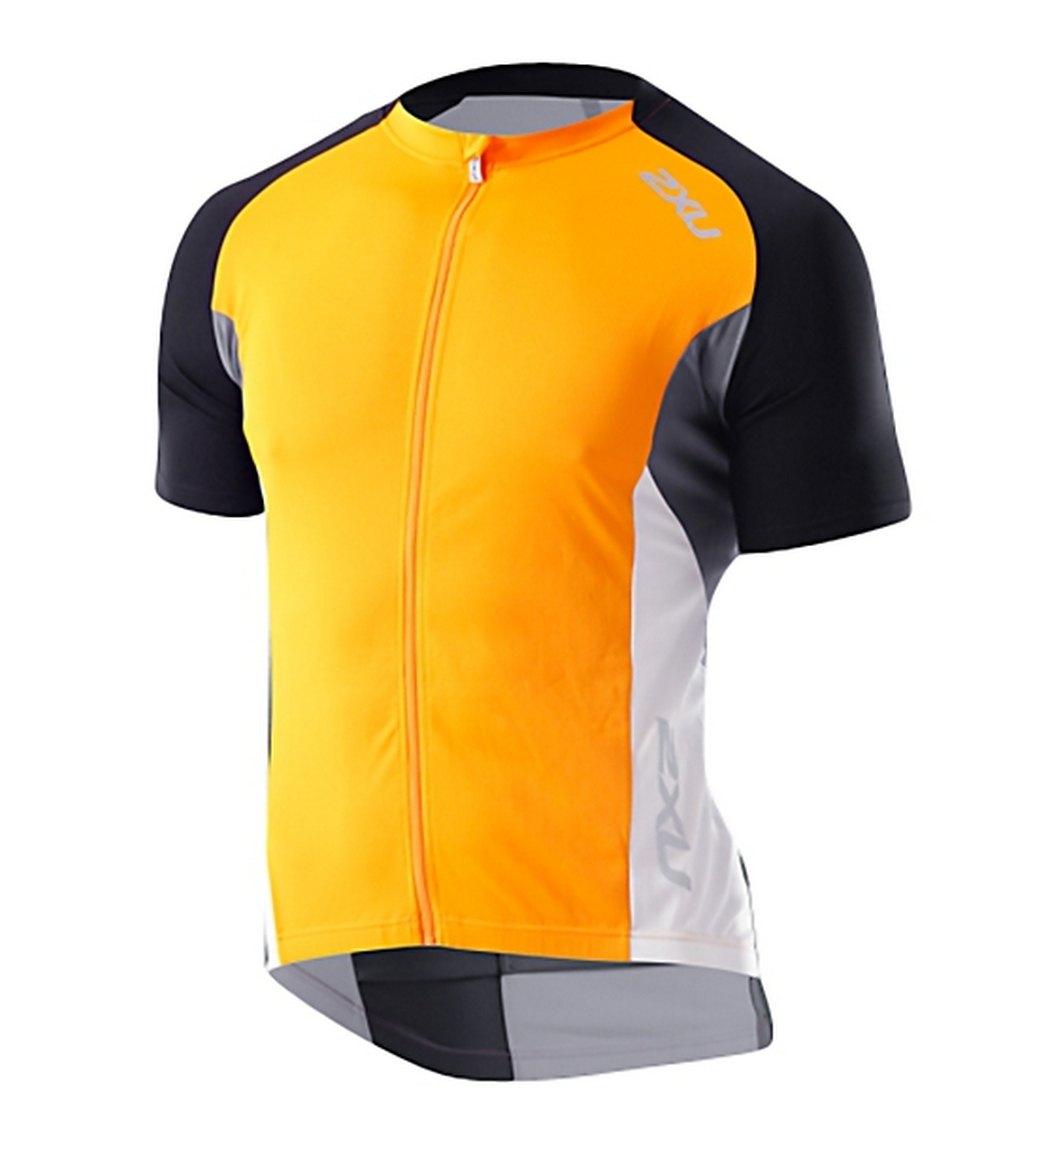 02e944a01 2XU Men s Road Comp Cycling Jersey at SwimOutlet.com - Free Shipping